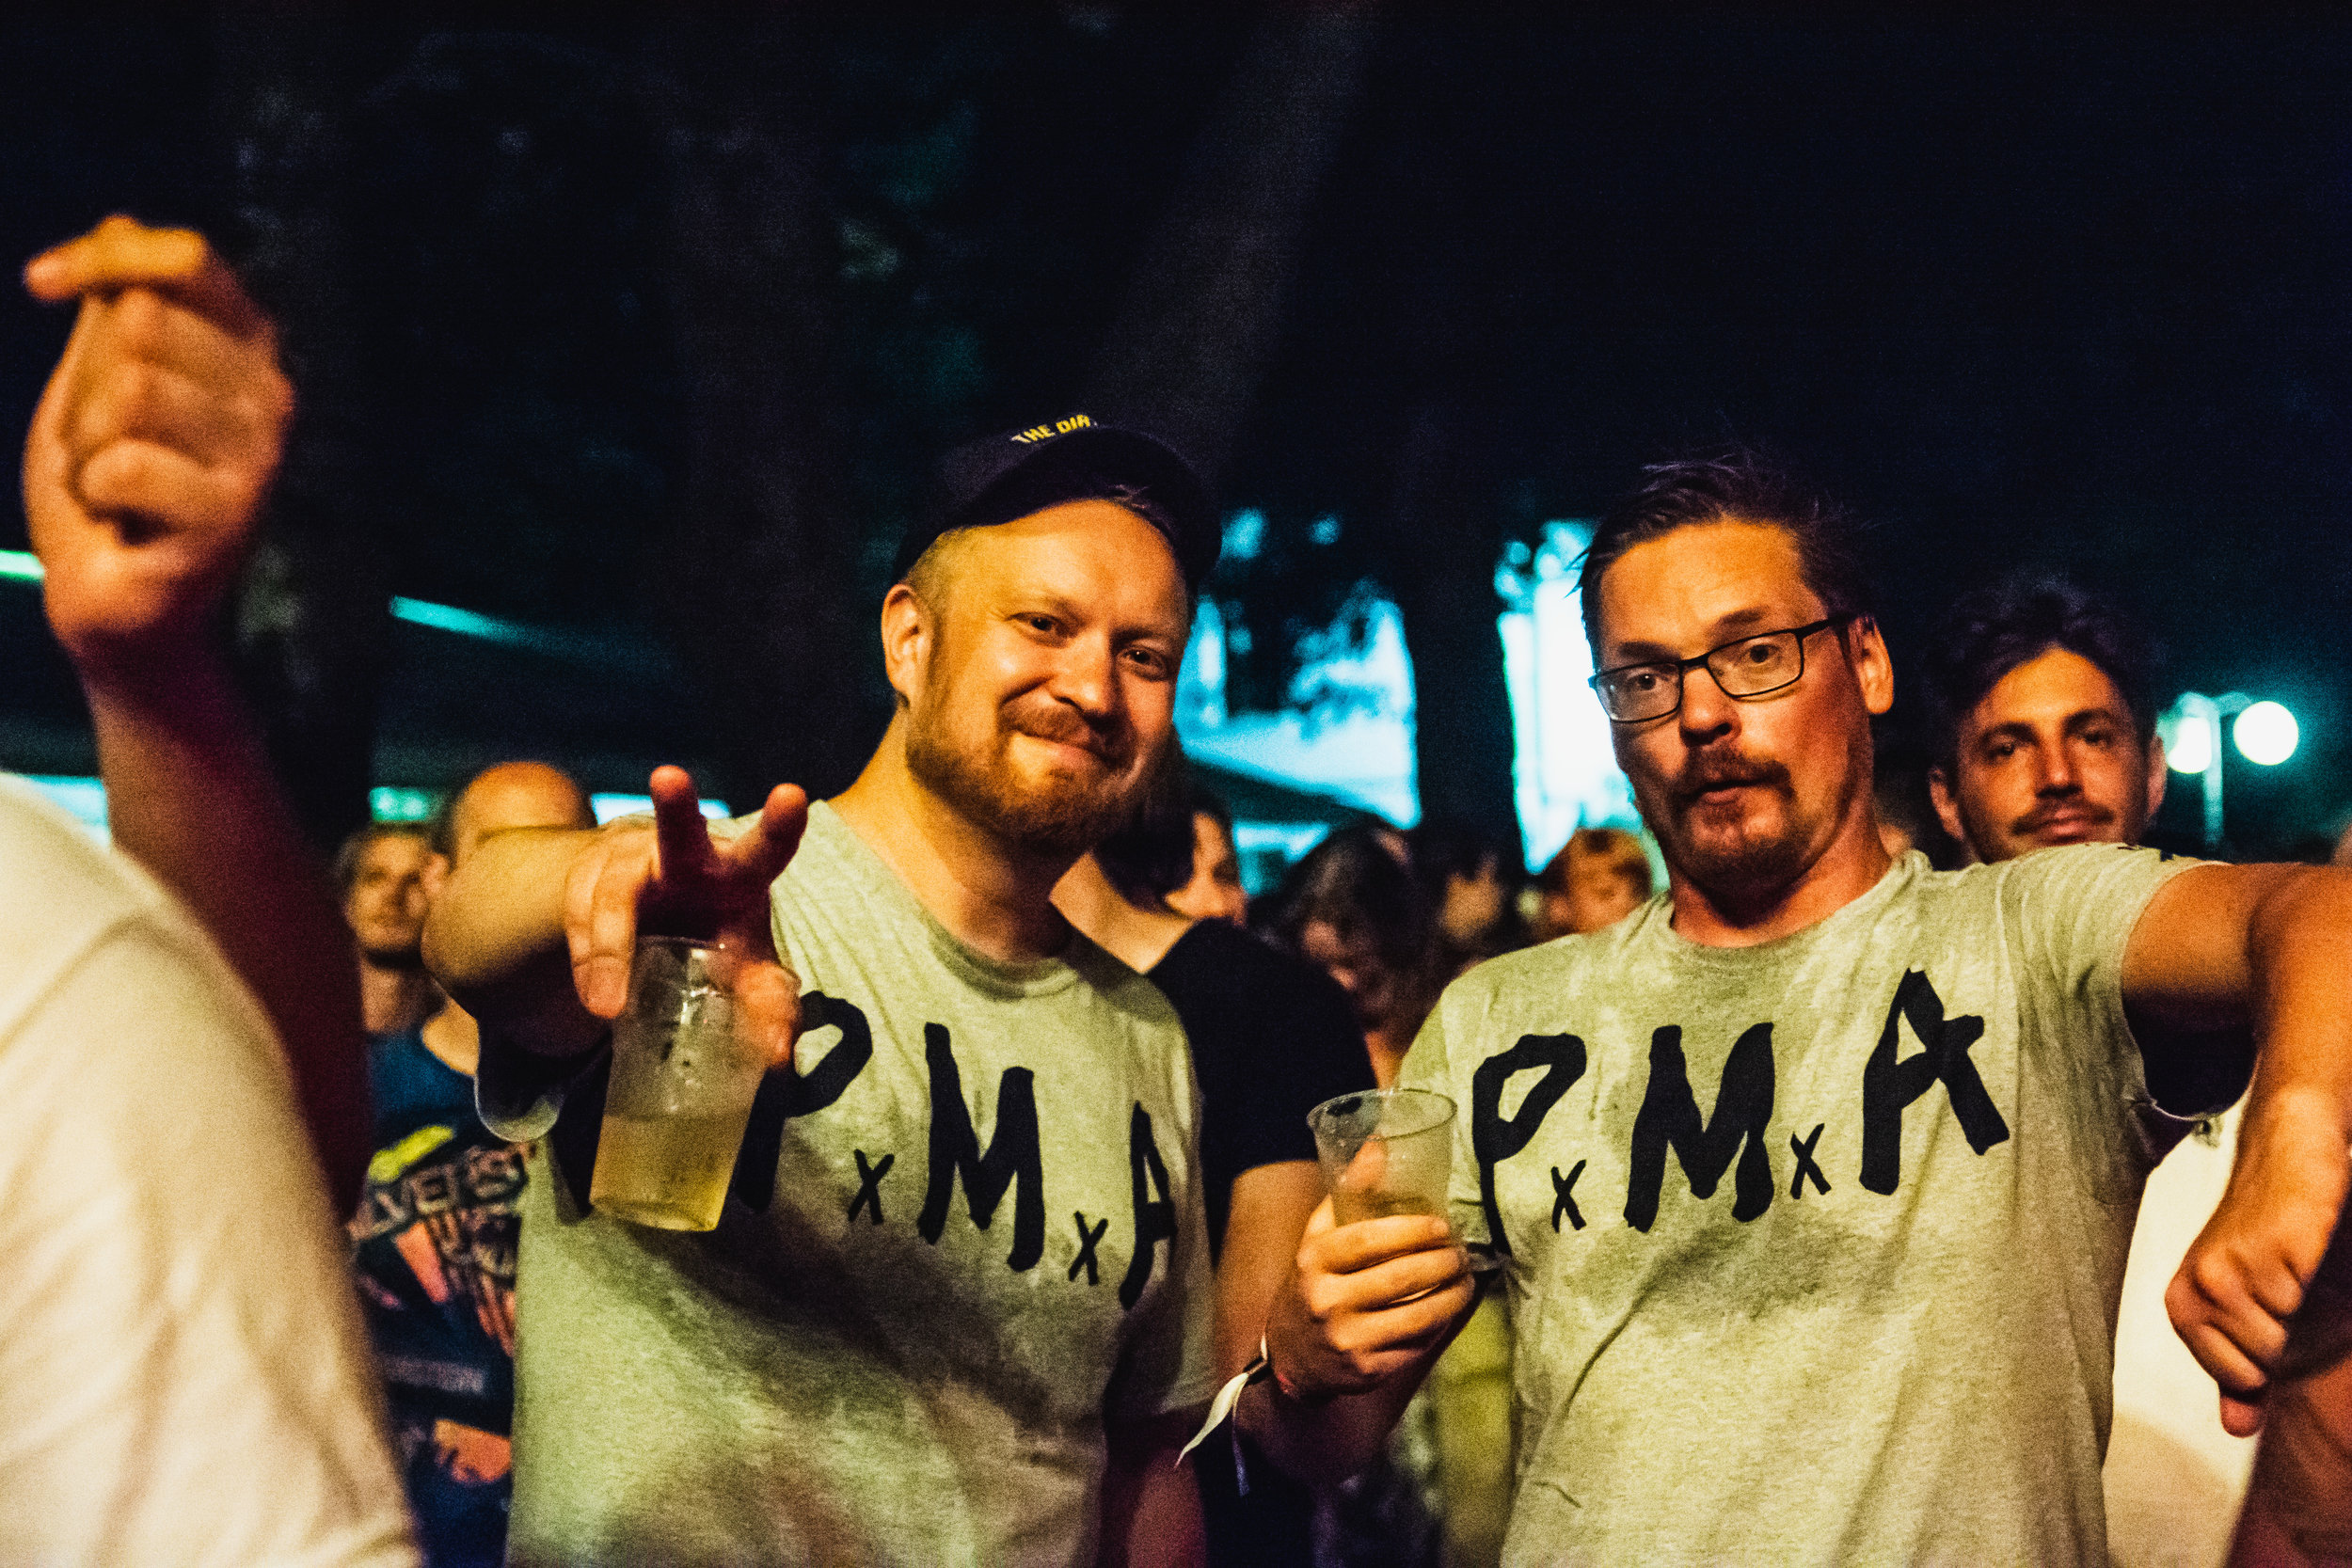 Punk-Rock-Holiday-Wednesday_79_2018August 08, 2018.jpg